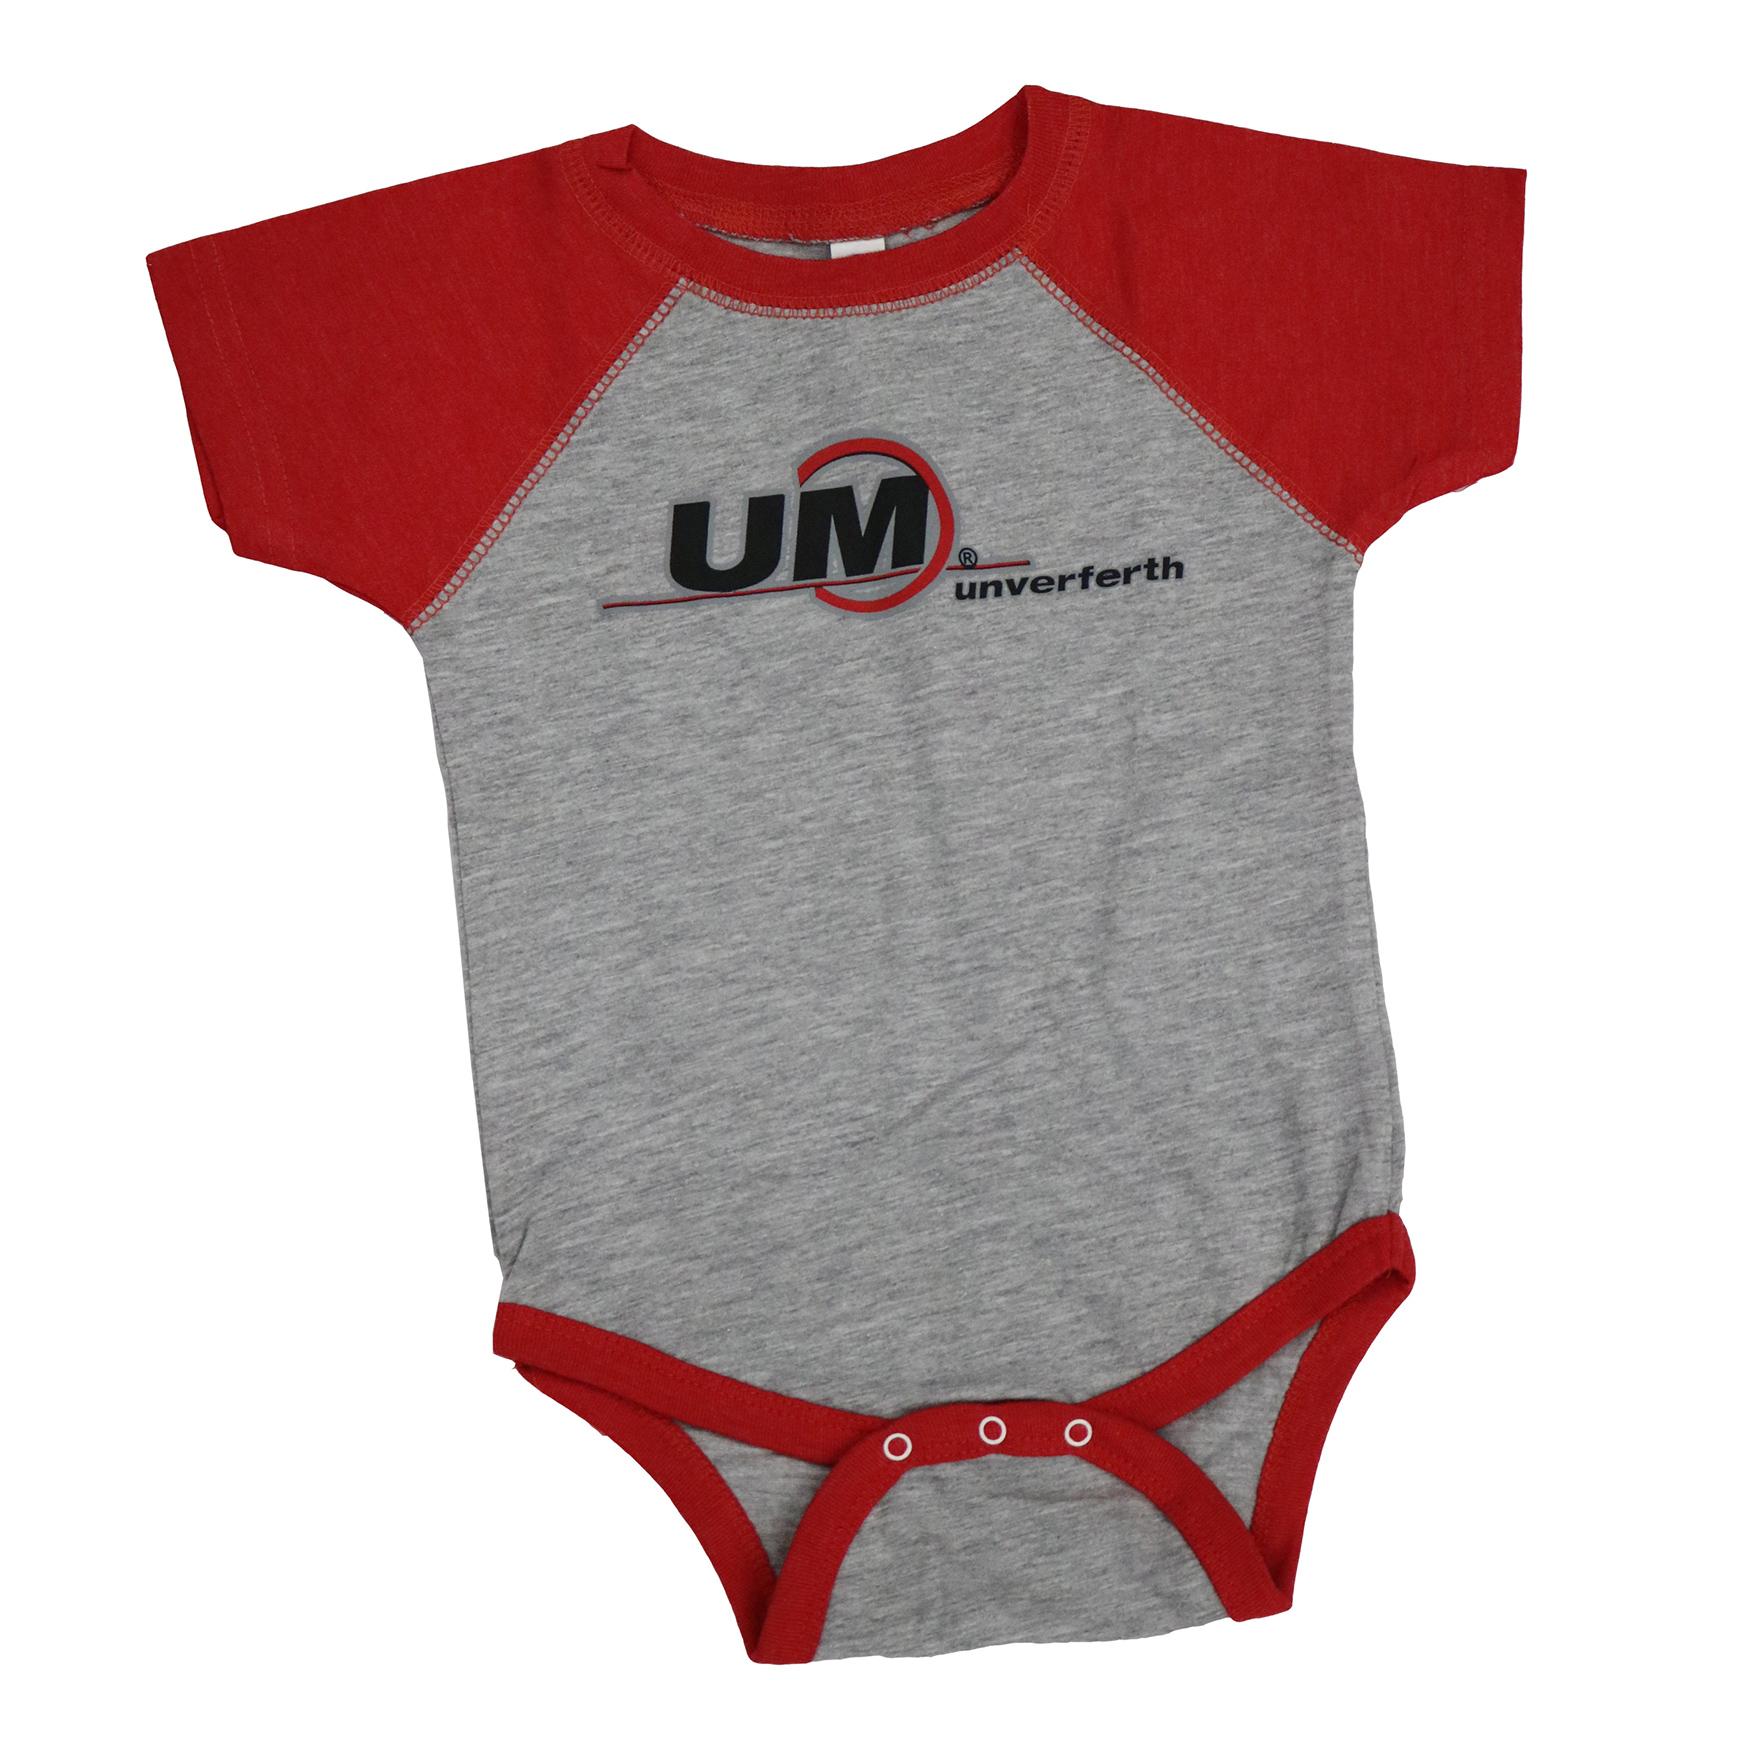 Infant Um Brand Baseball Jersey Bodysuit Shirts Unverferth Mfg